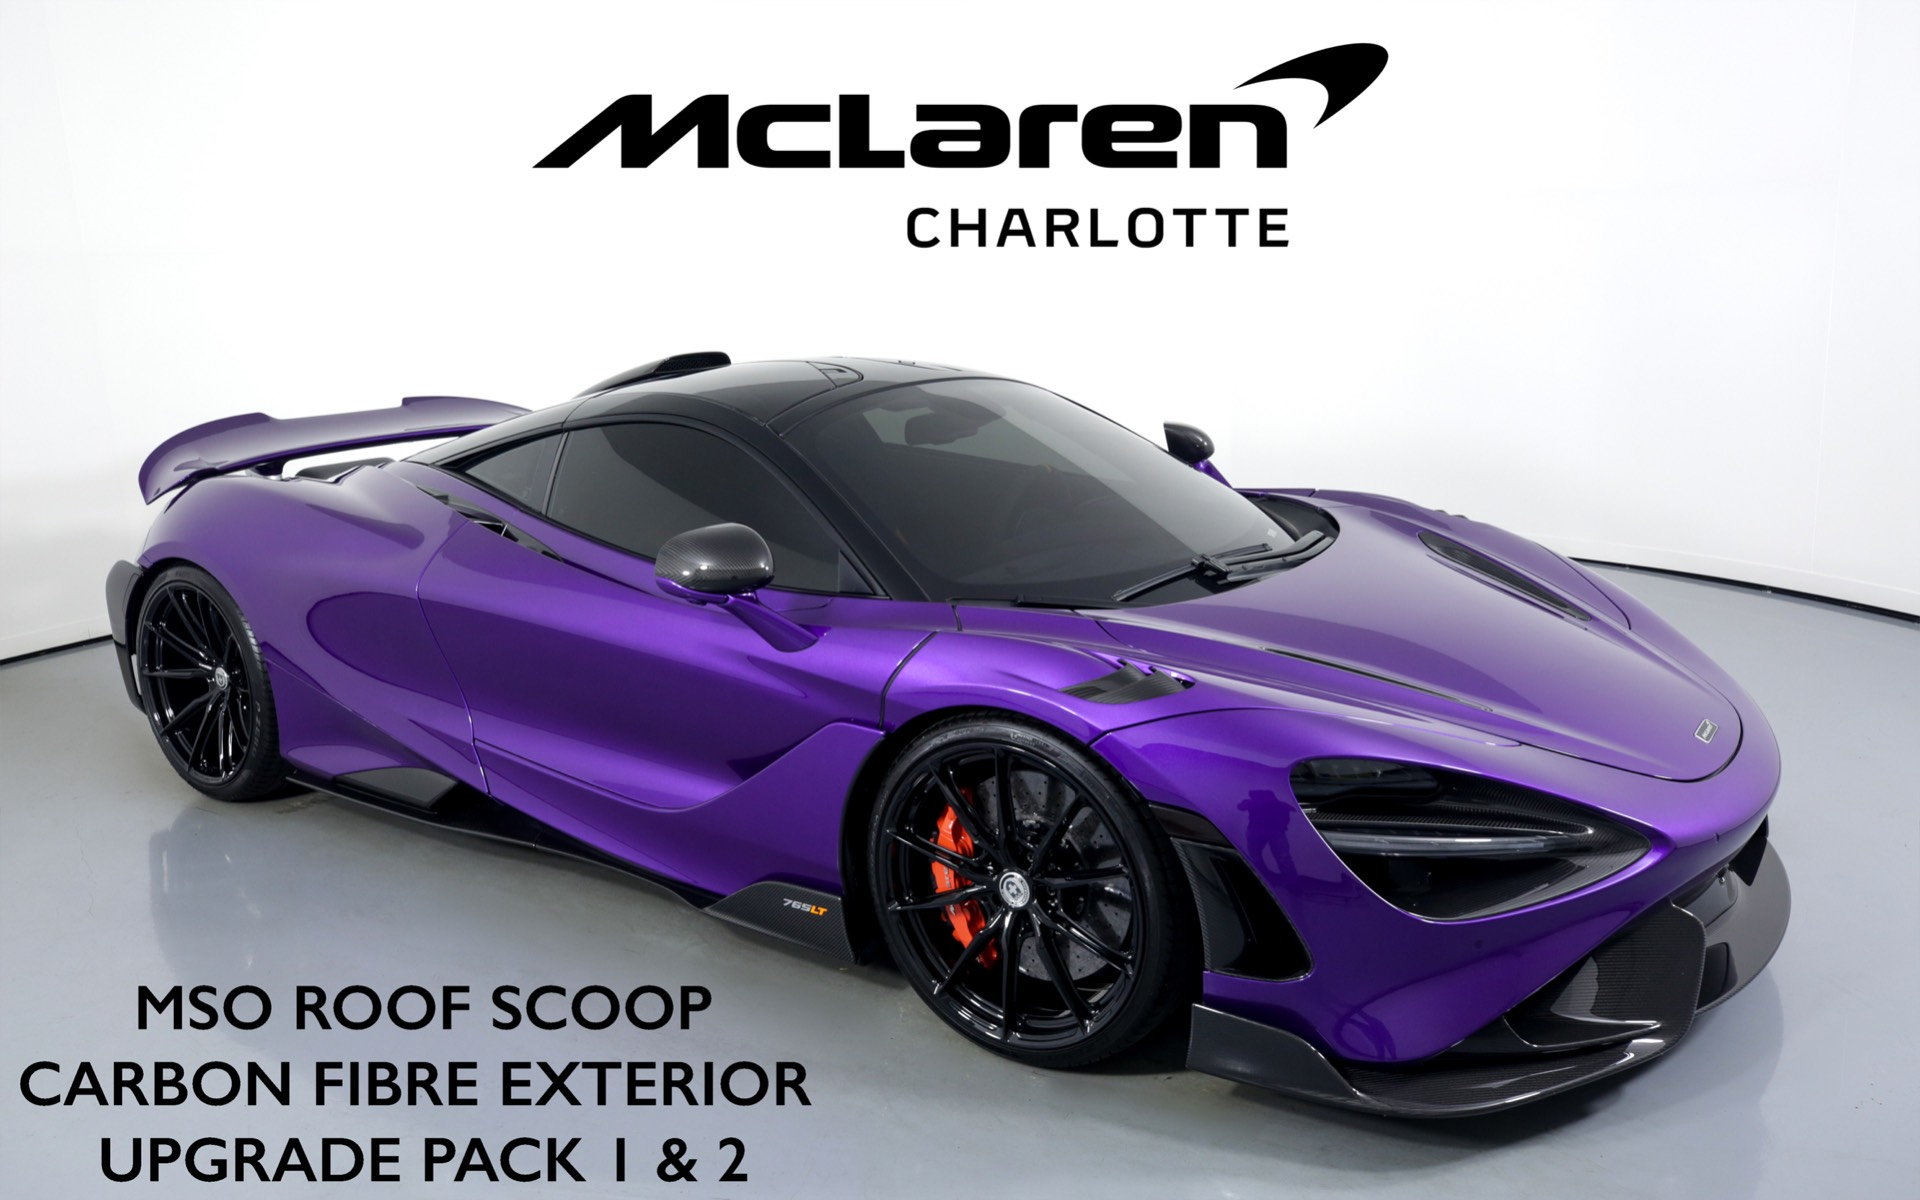 New 2021 MCLAREN 765LT    Charlotte, NC